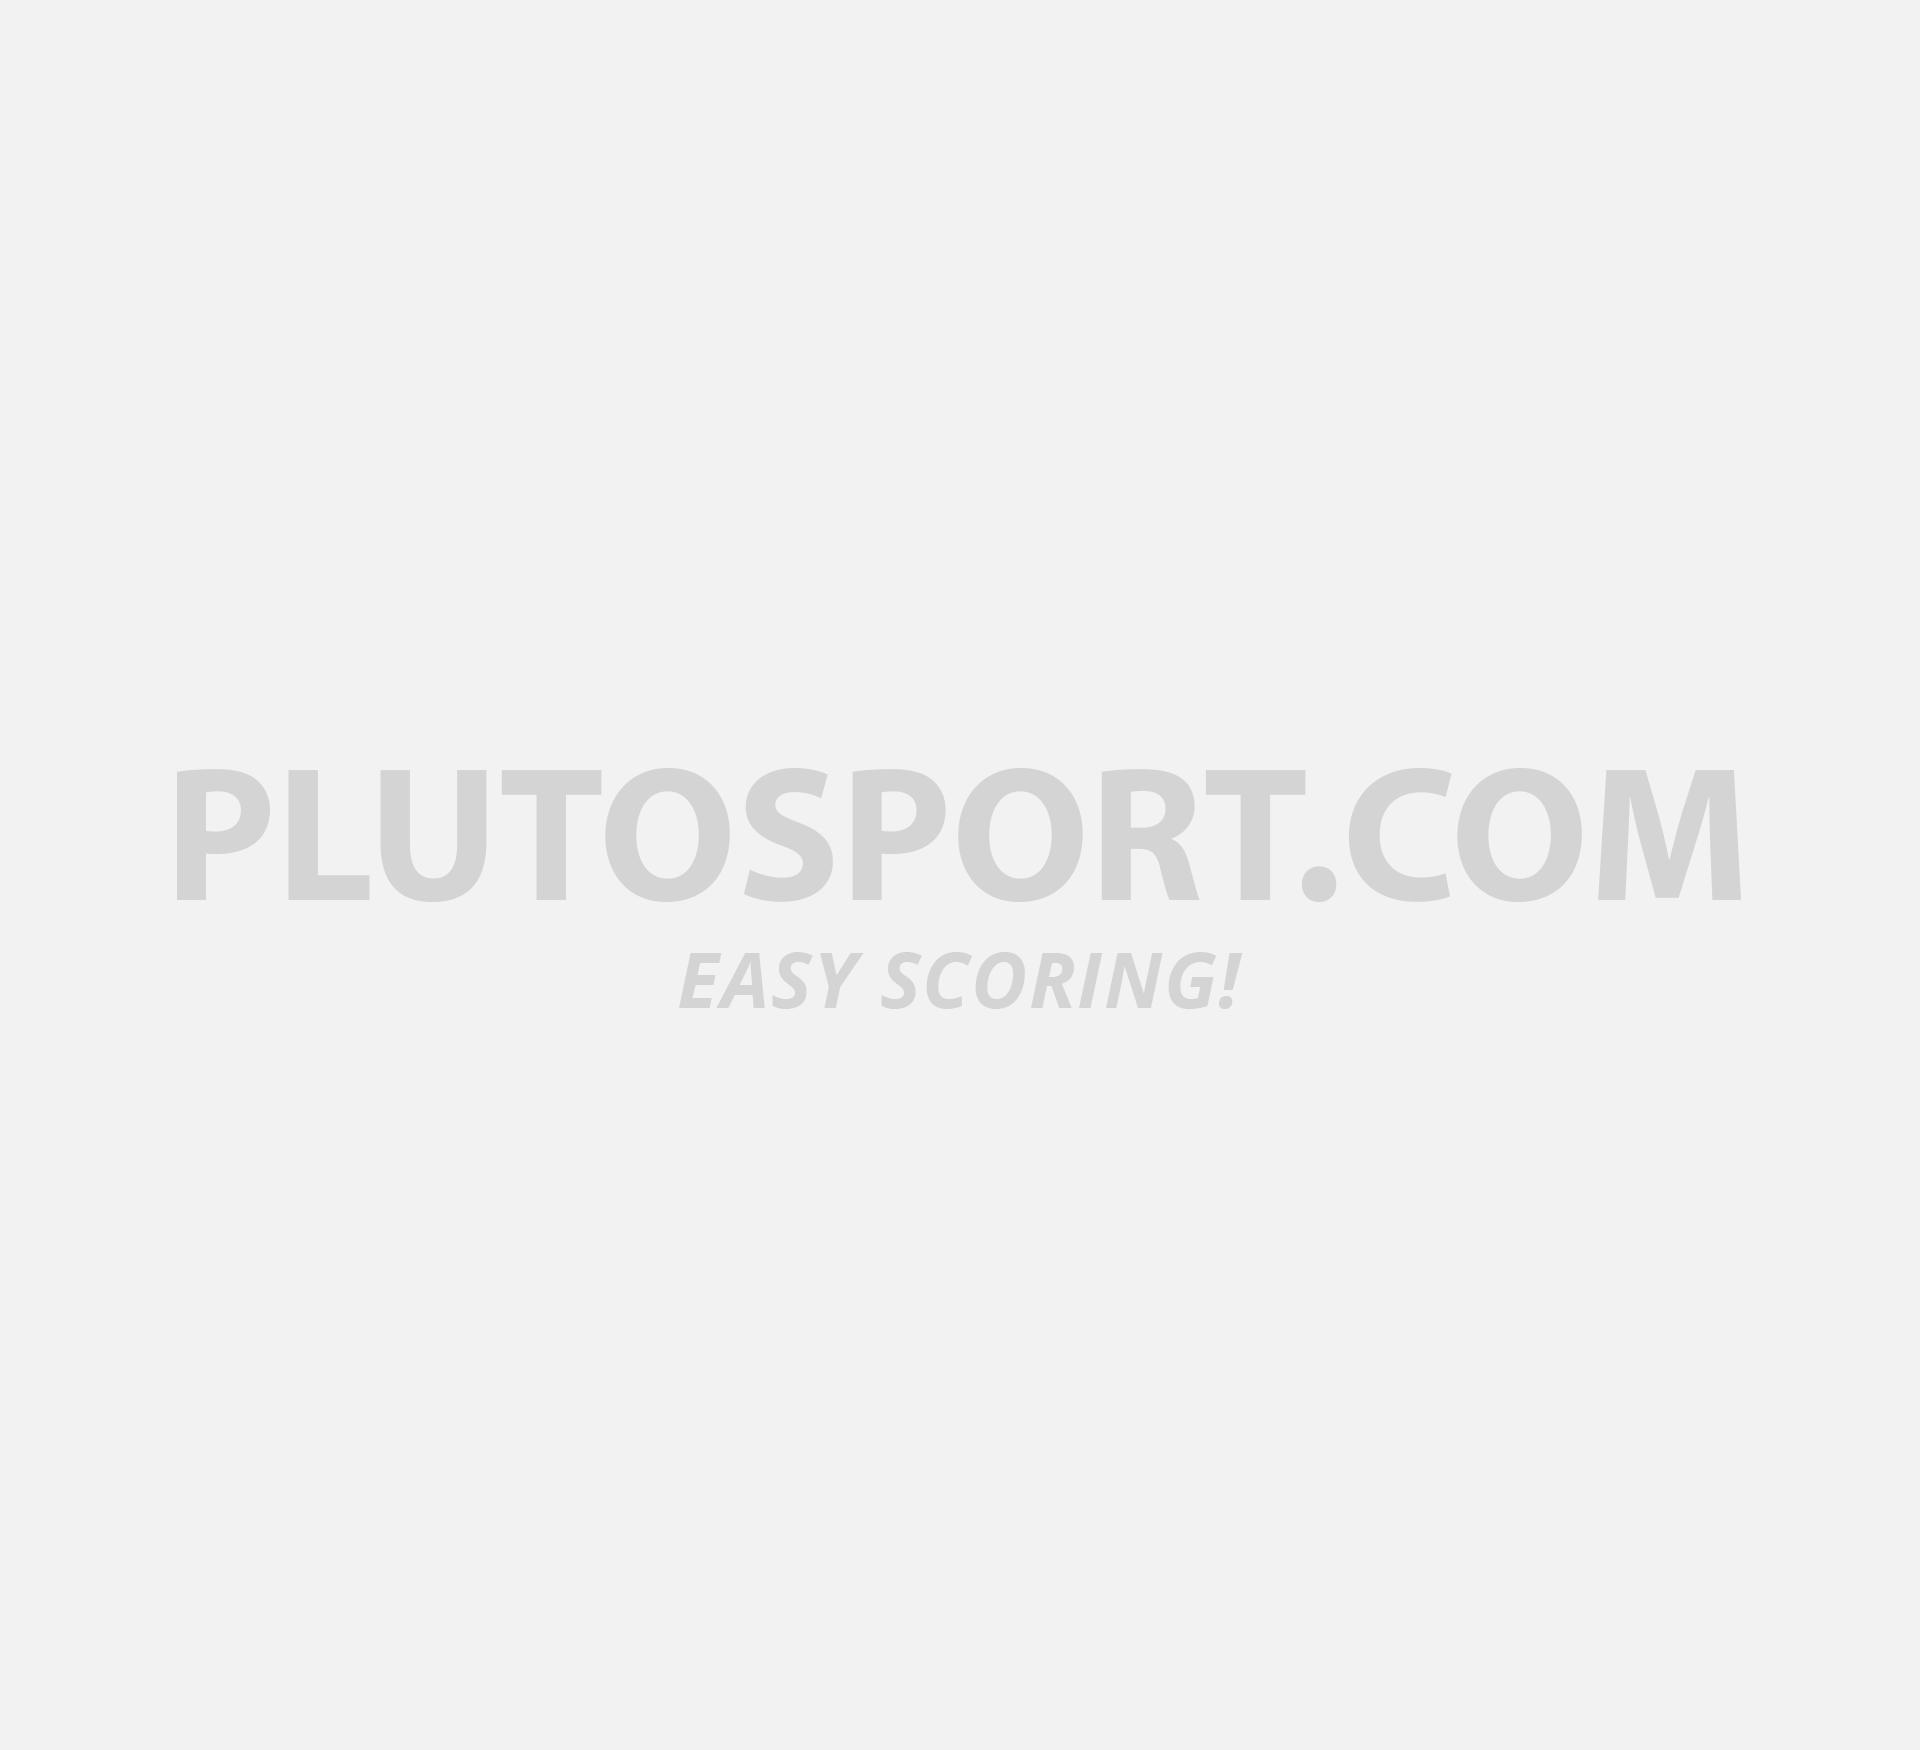 Dunlop Club Champ 1* 40+ Tabe Tennis Ball (6-pack)